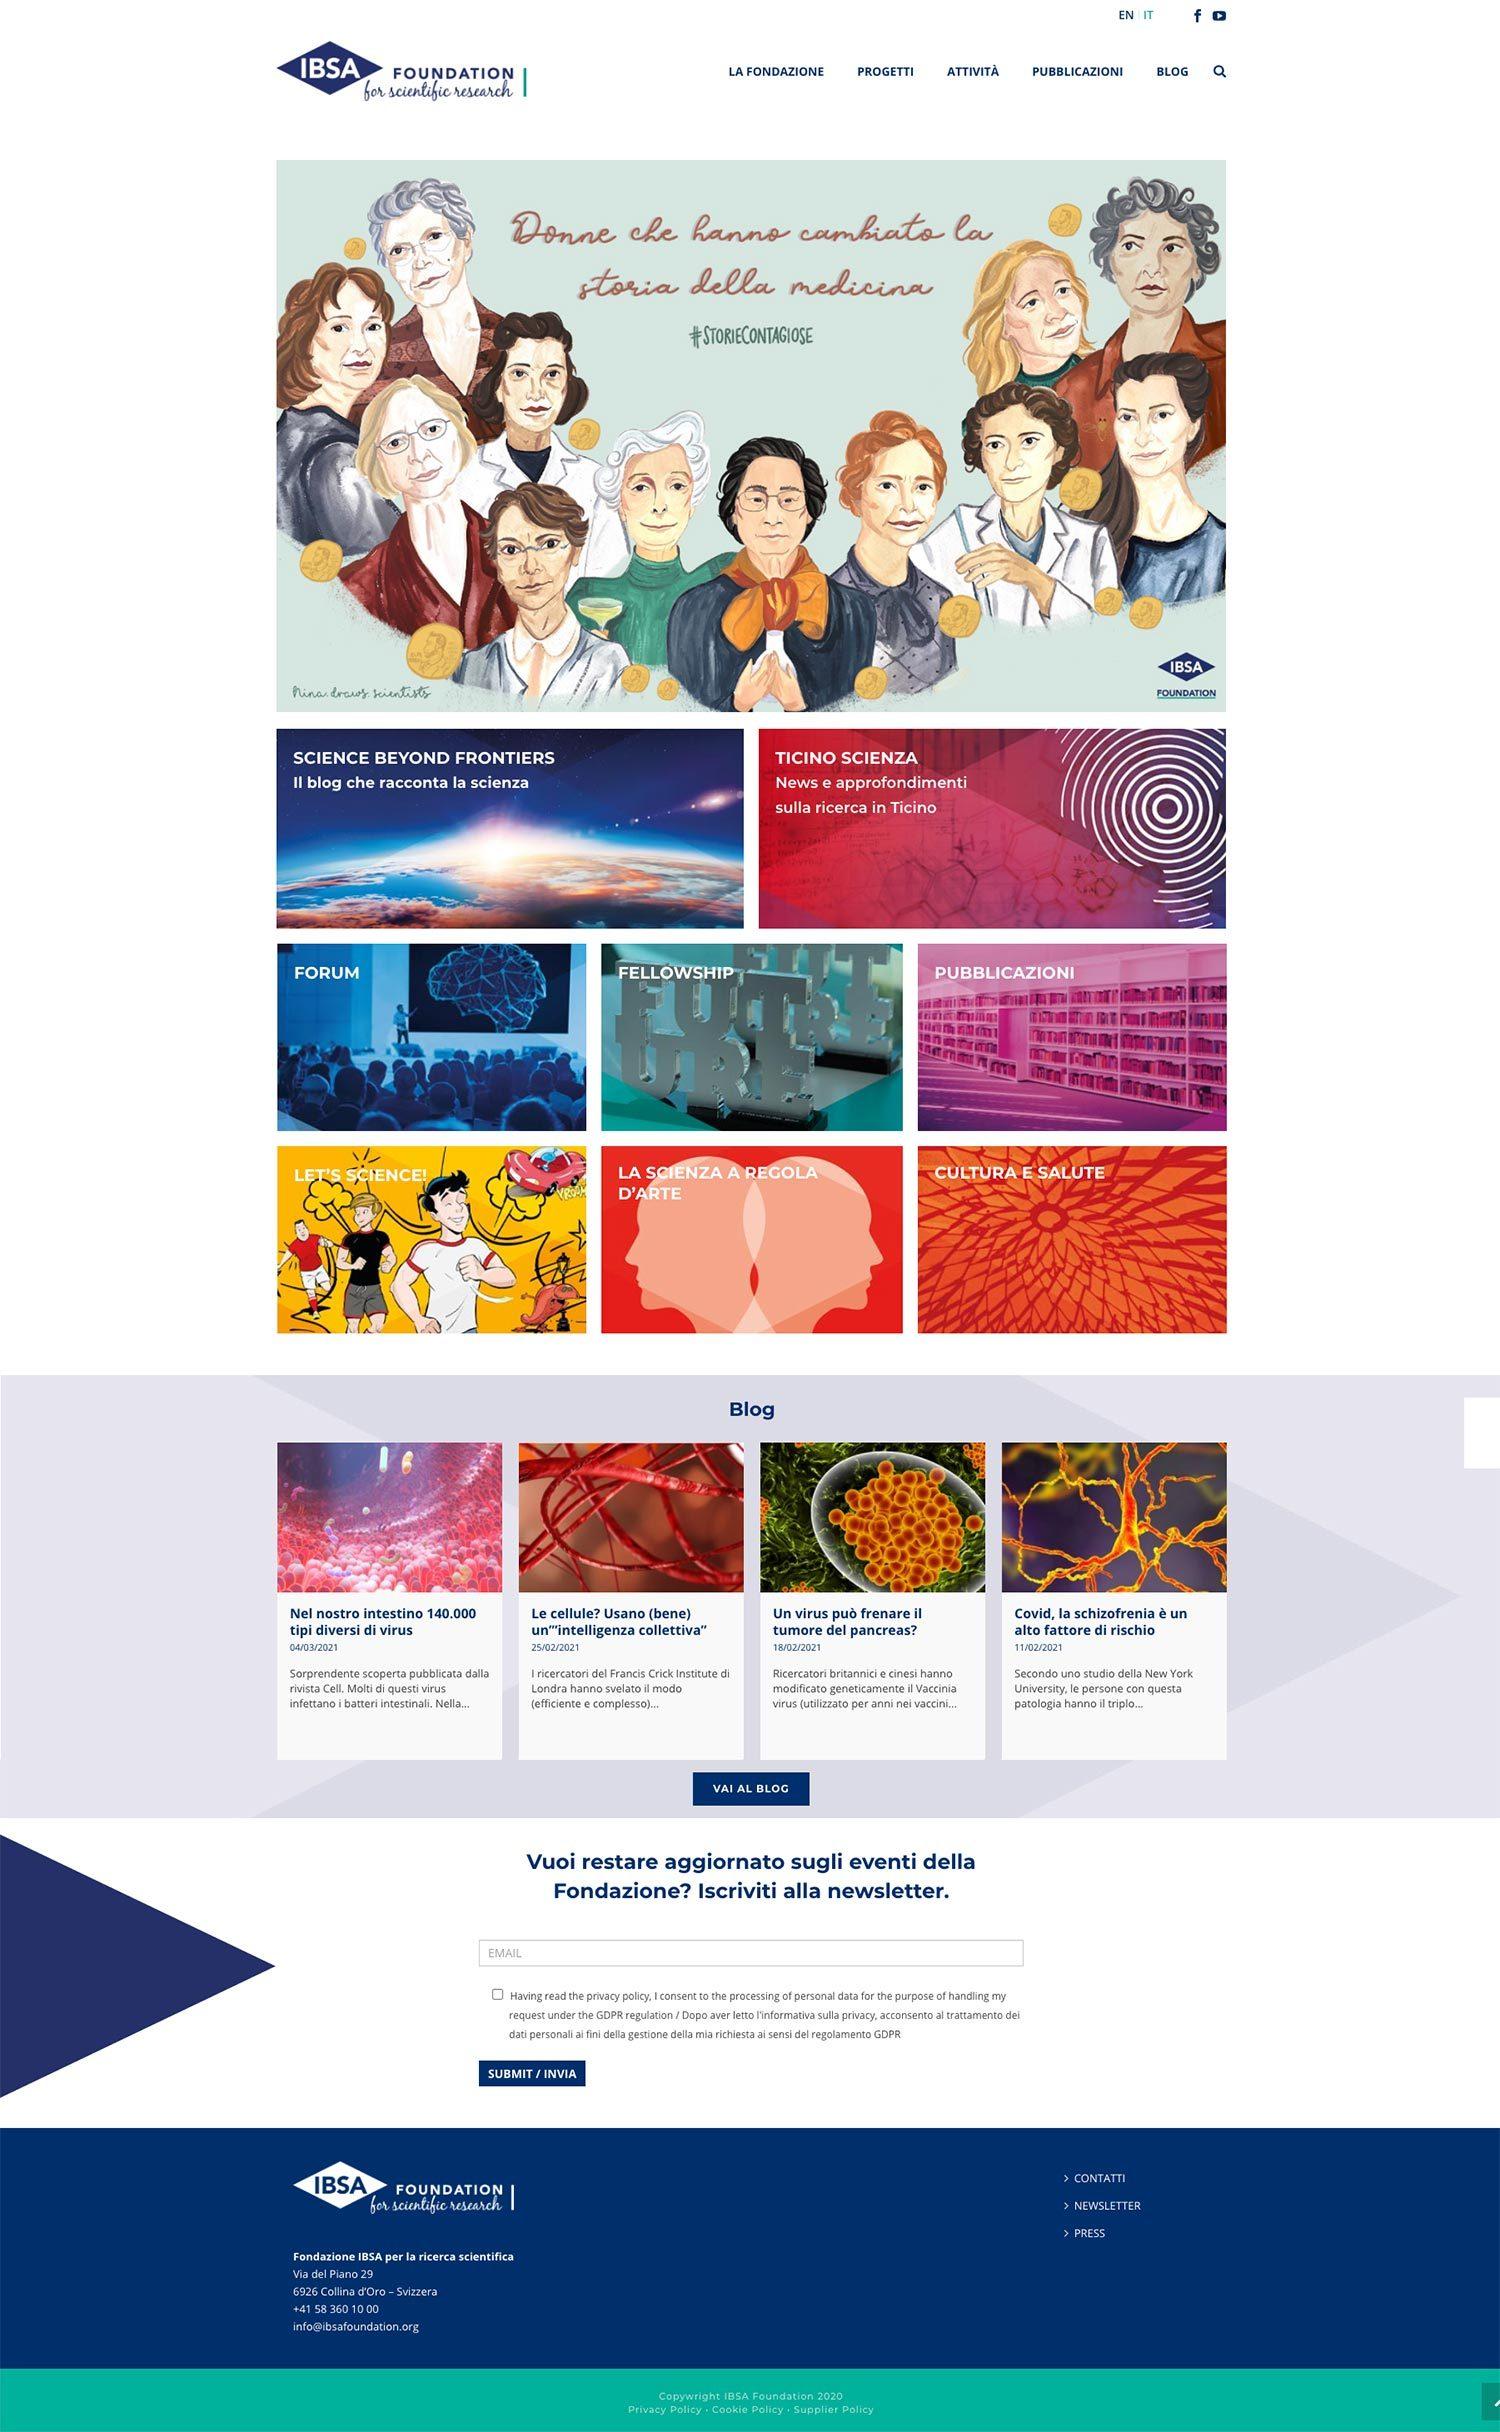 Alberto Sala Design IBSA Foundation website